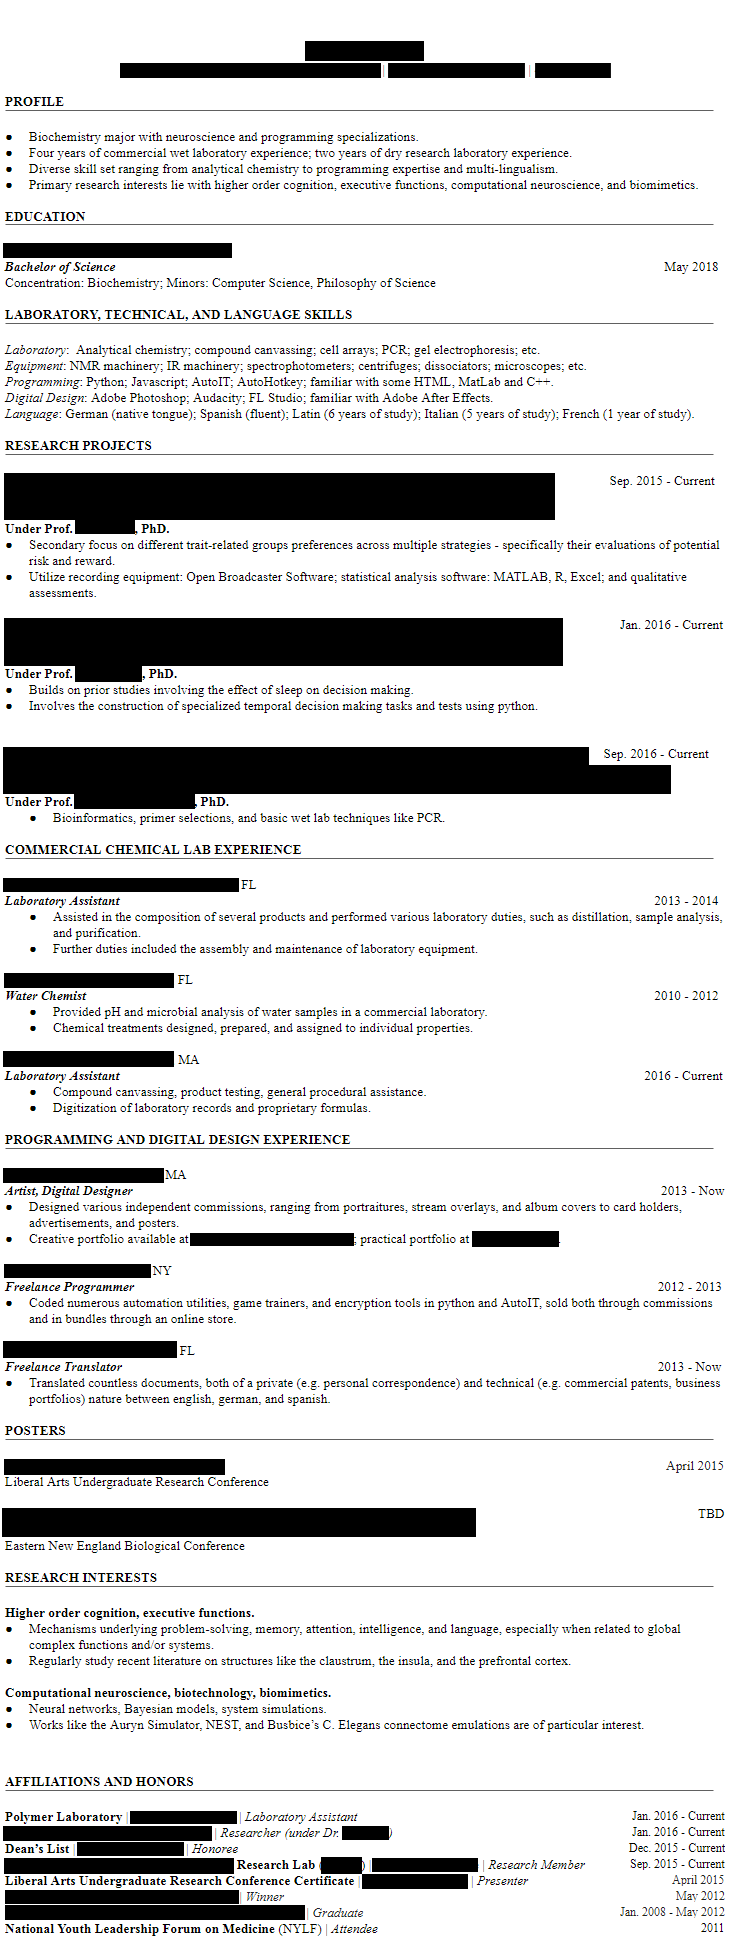 CV censored